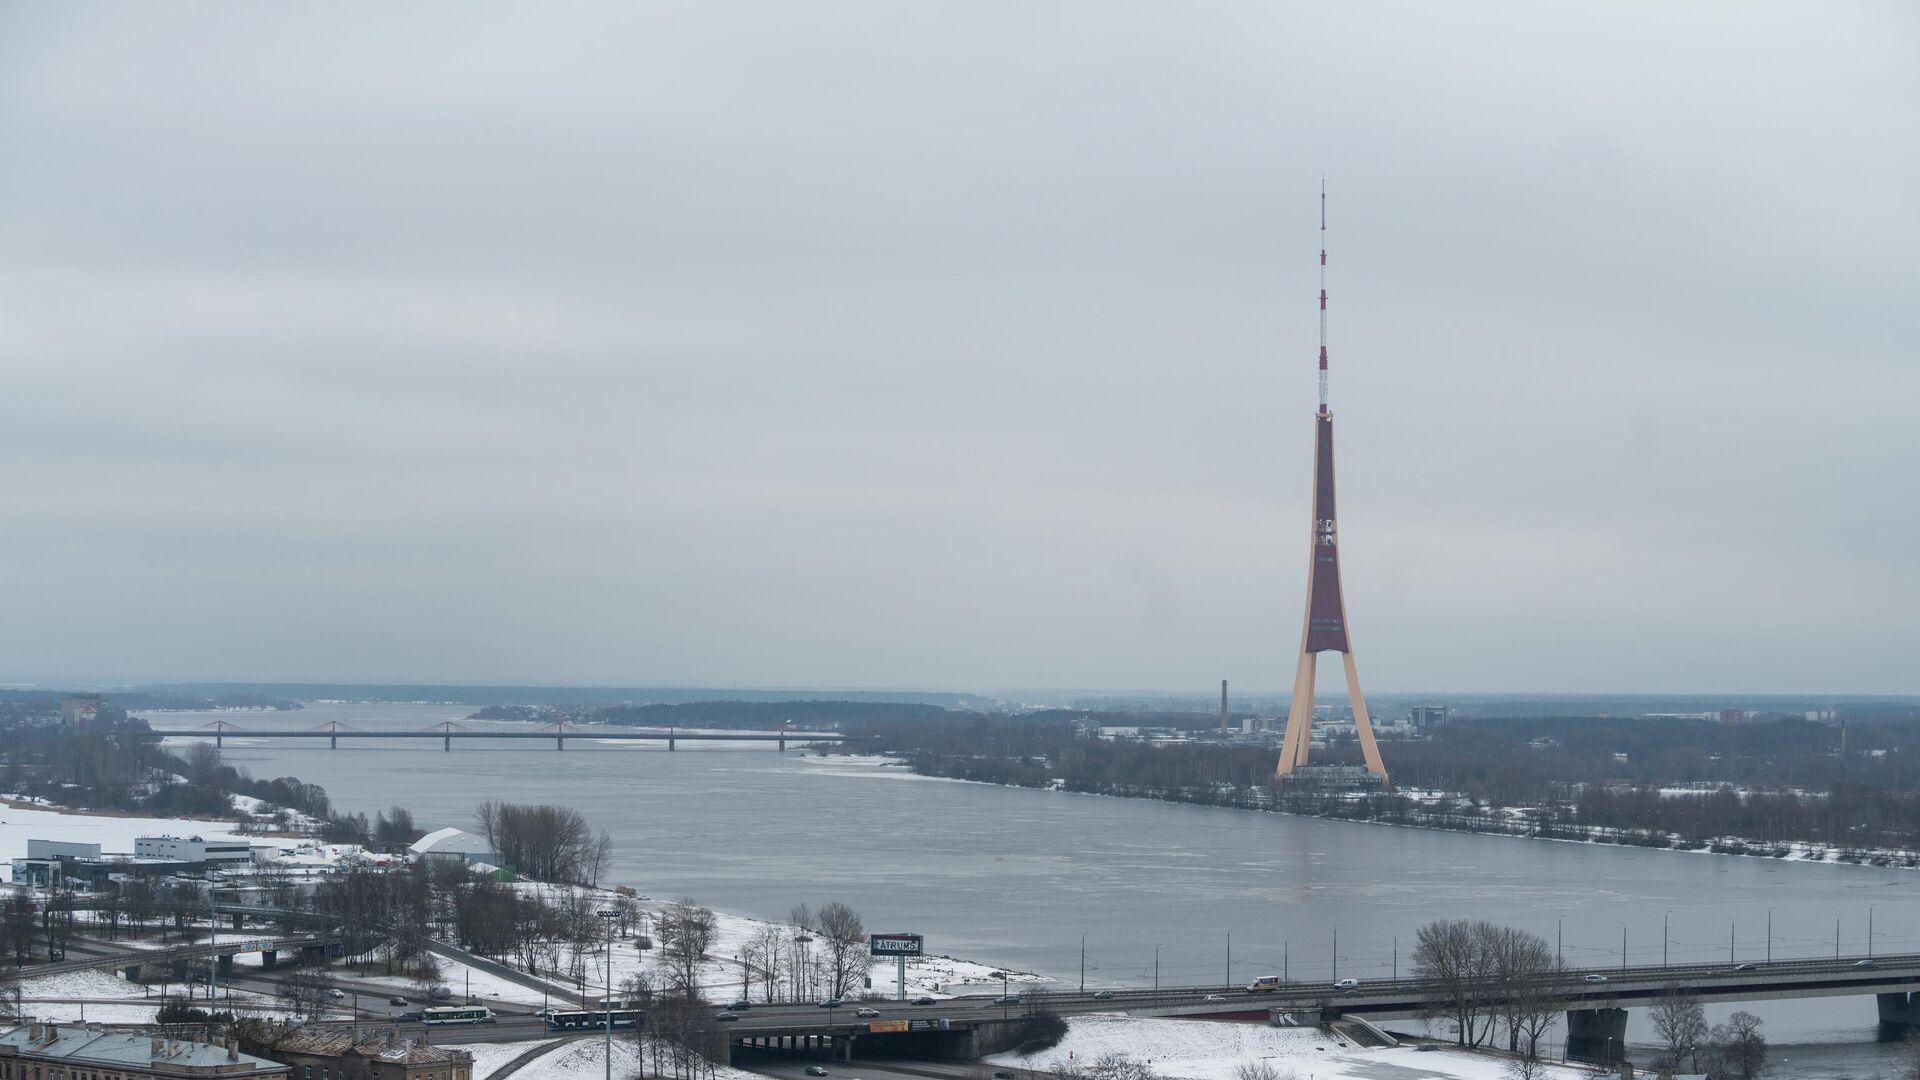 Вид на телевизионную башню Риги - РИА Новости, 1920, 06.05.2021